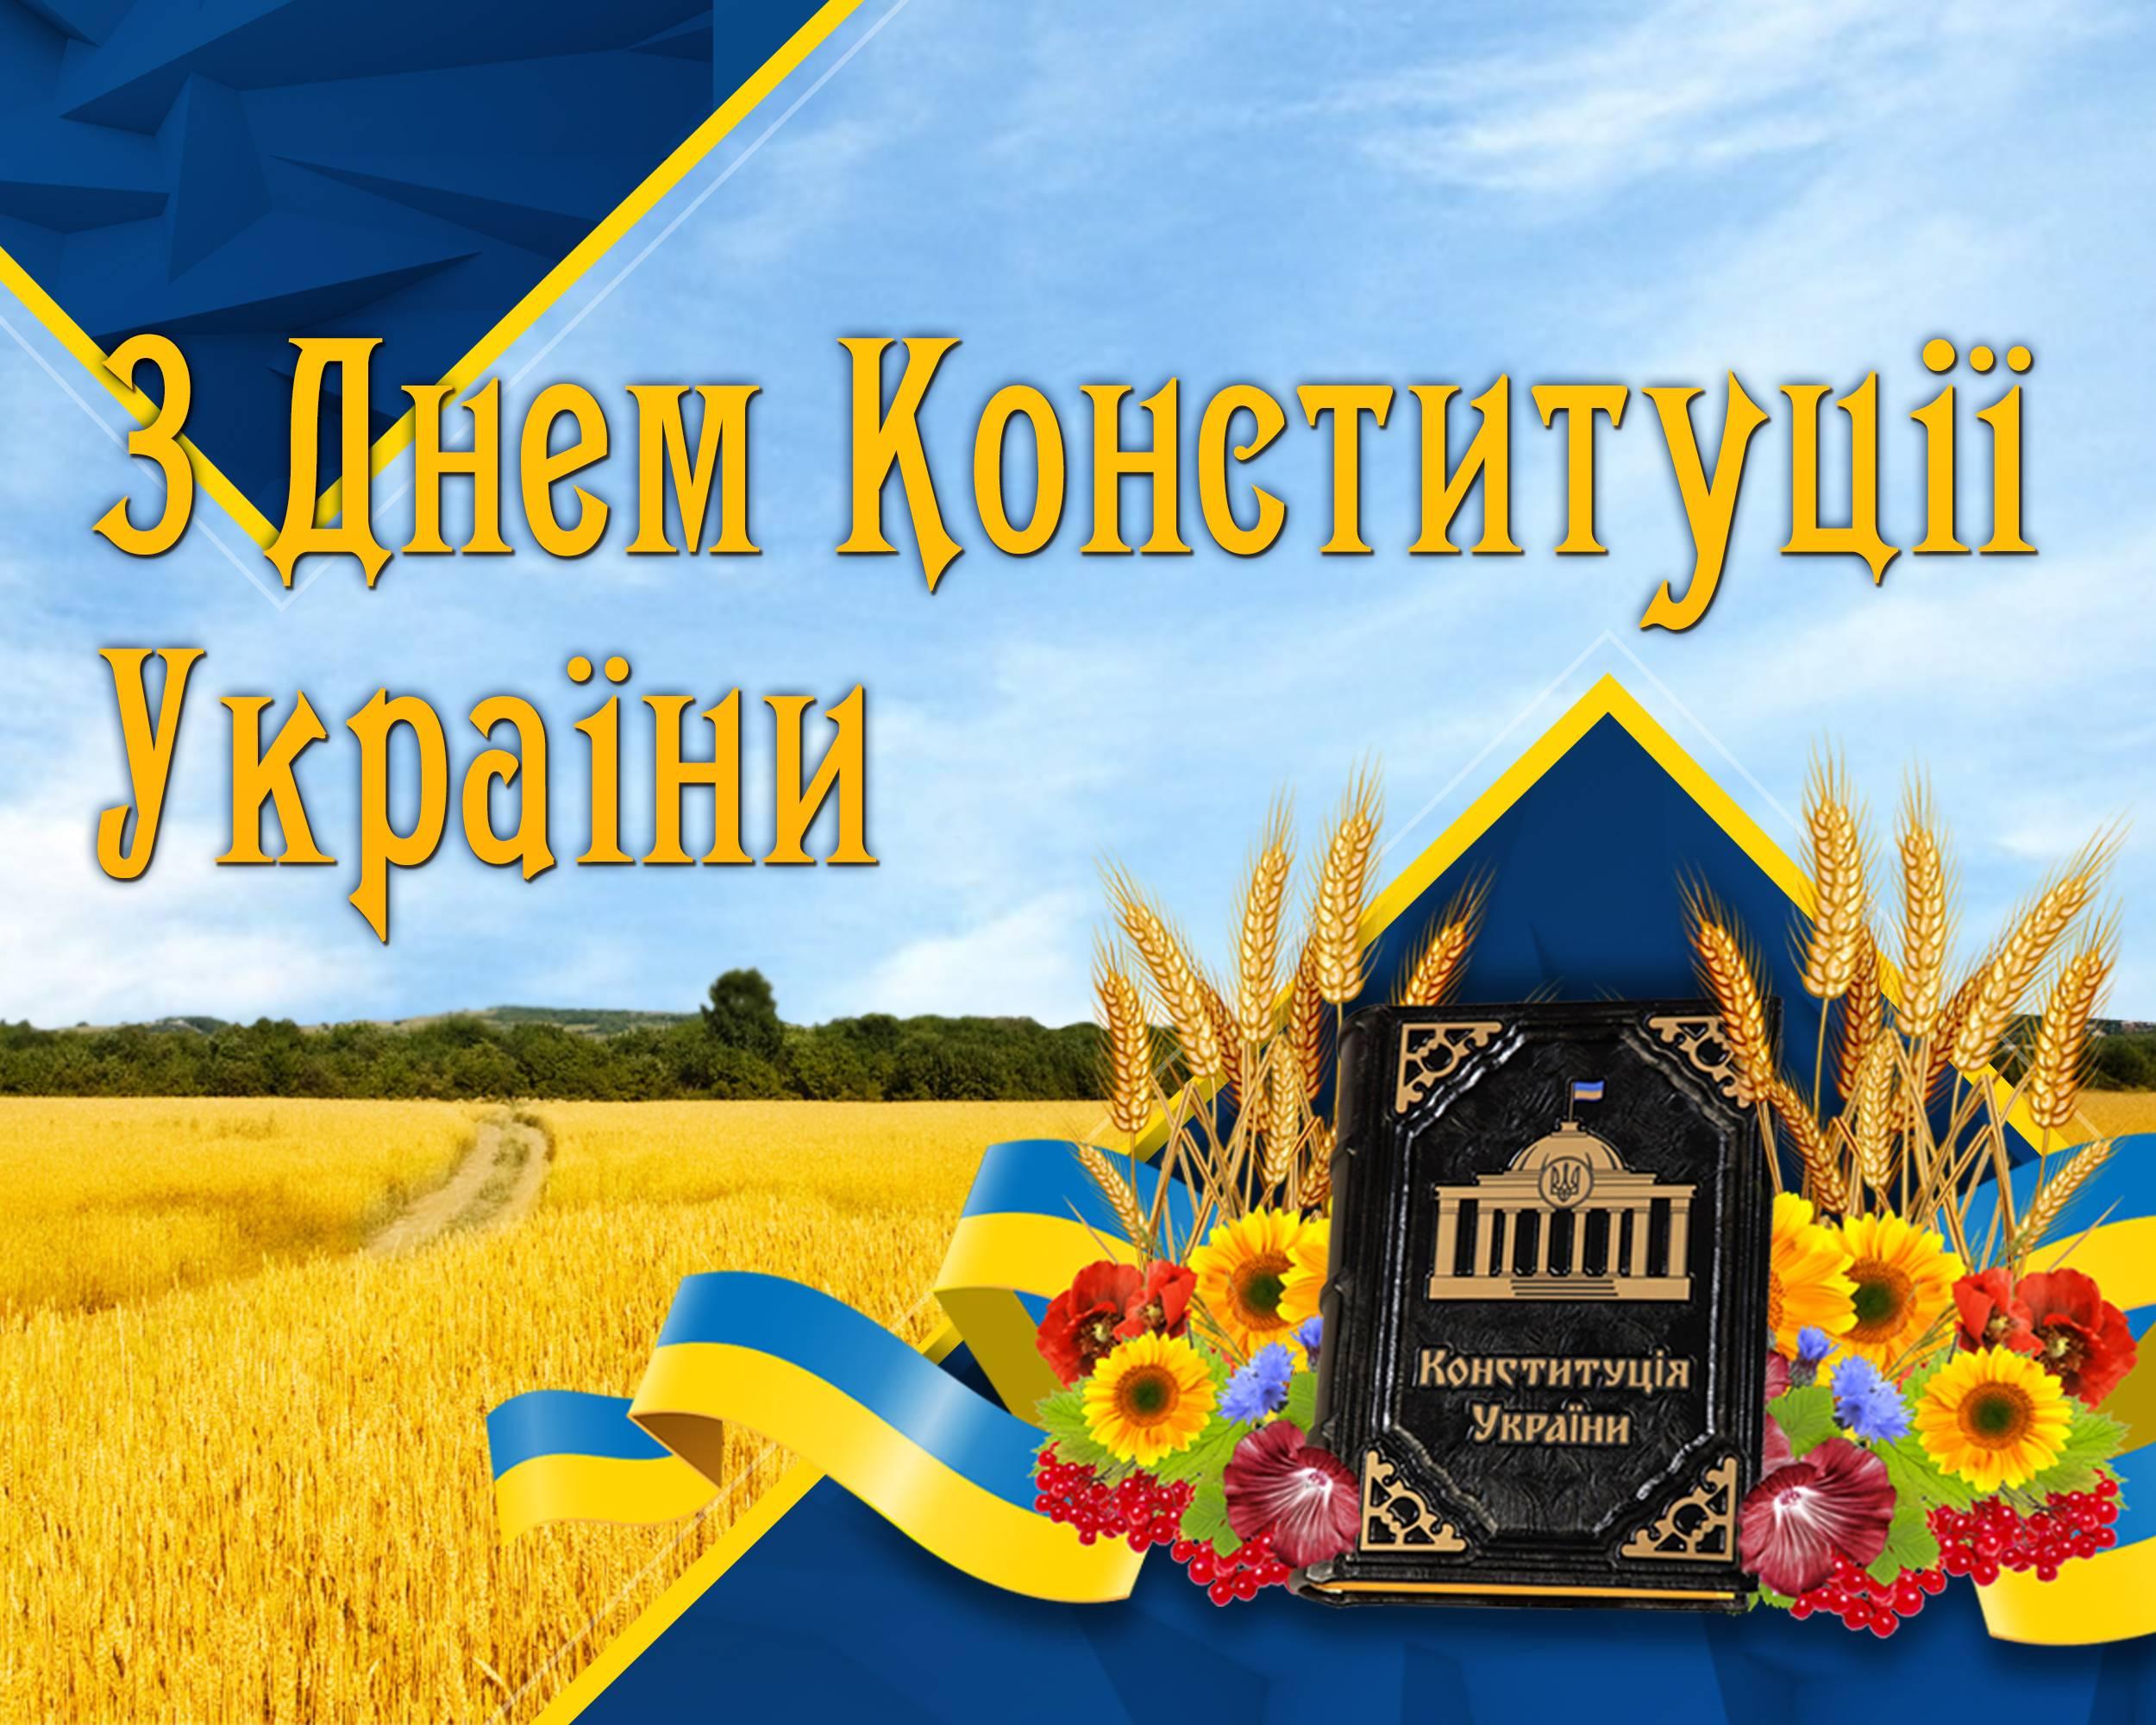 HDoboi.Kiev.ua - День Конституции Украины 2020, Constitution Day of Ukraine 2020